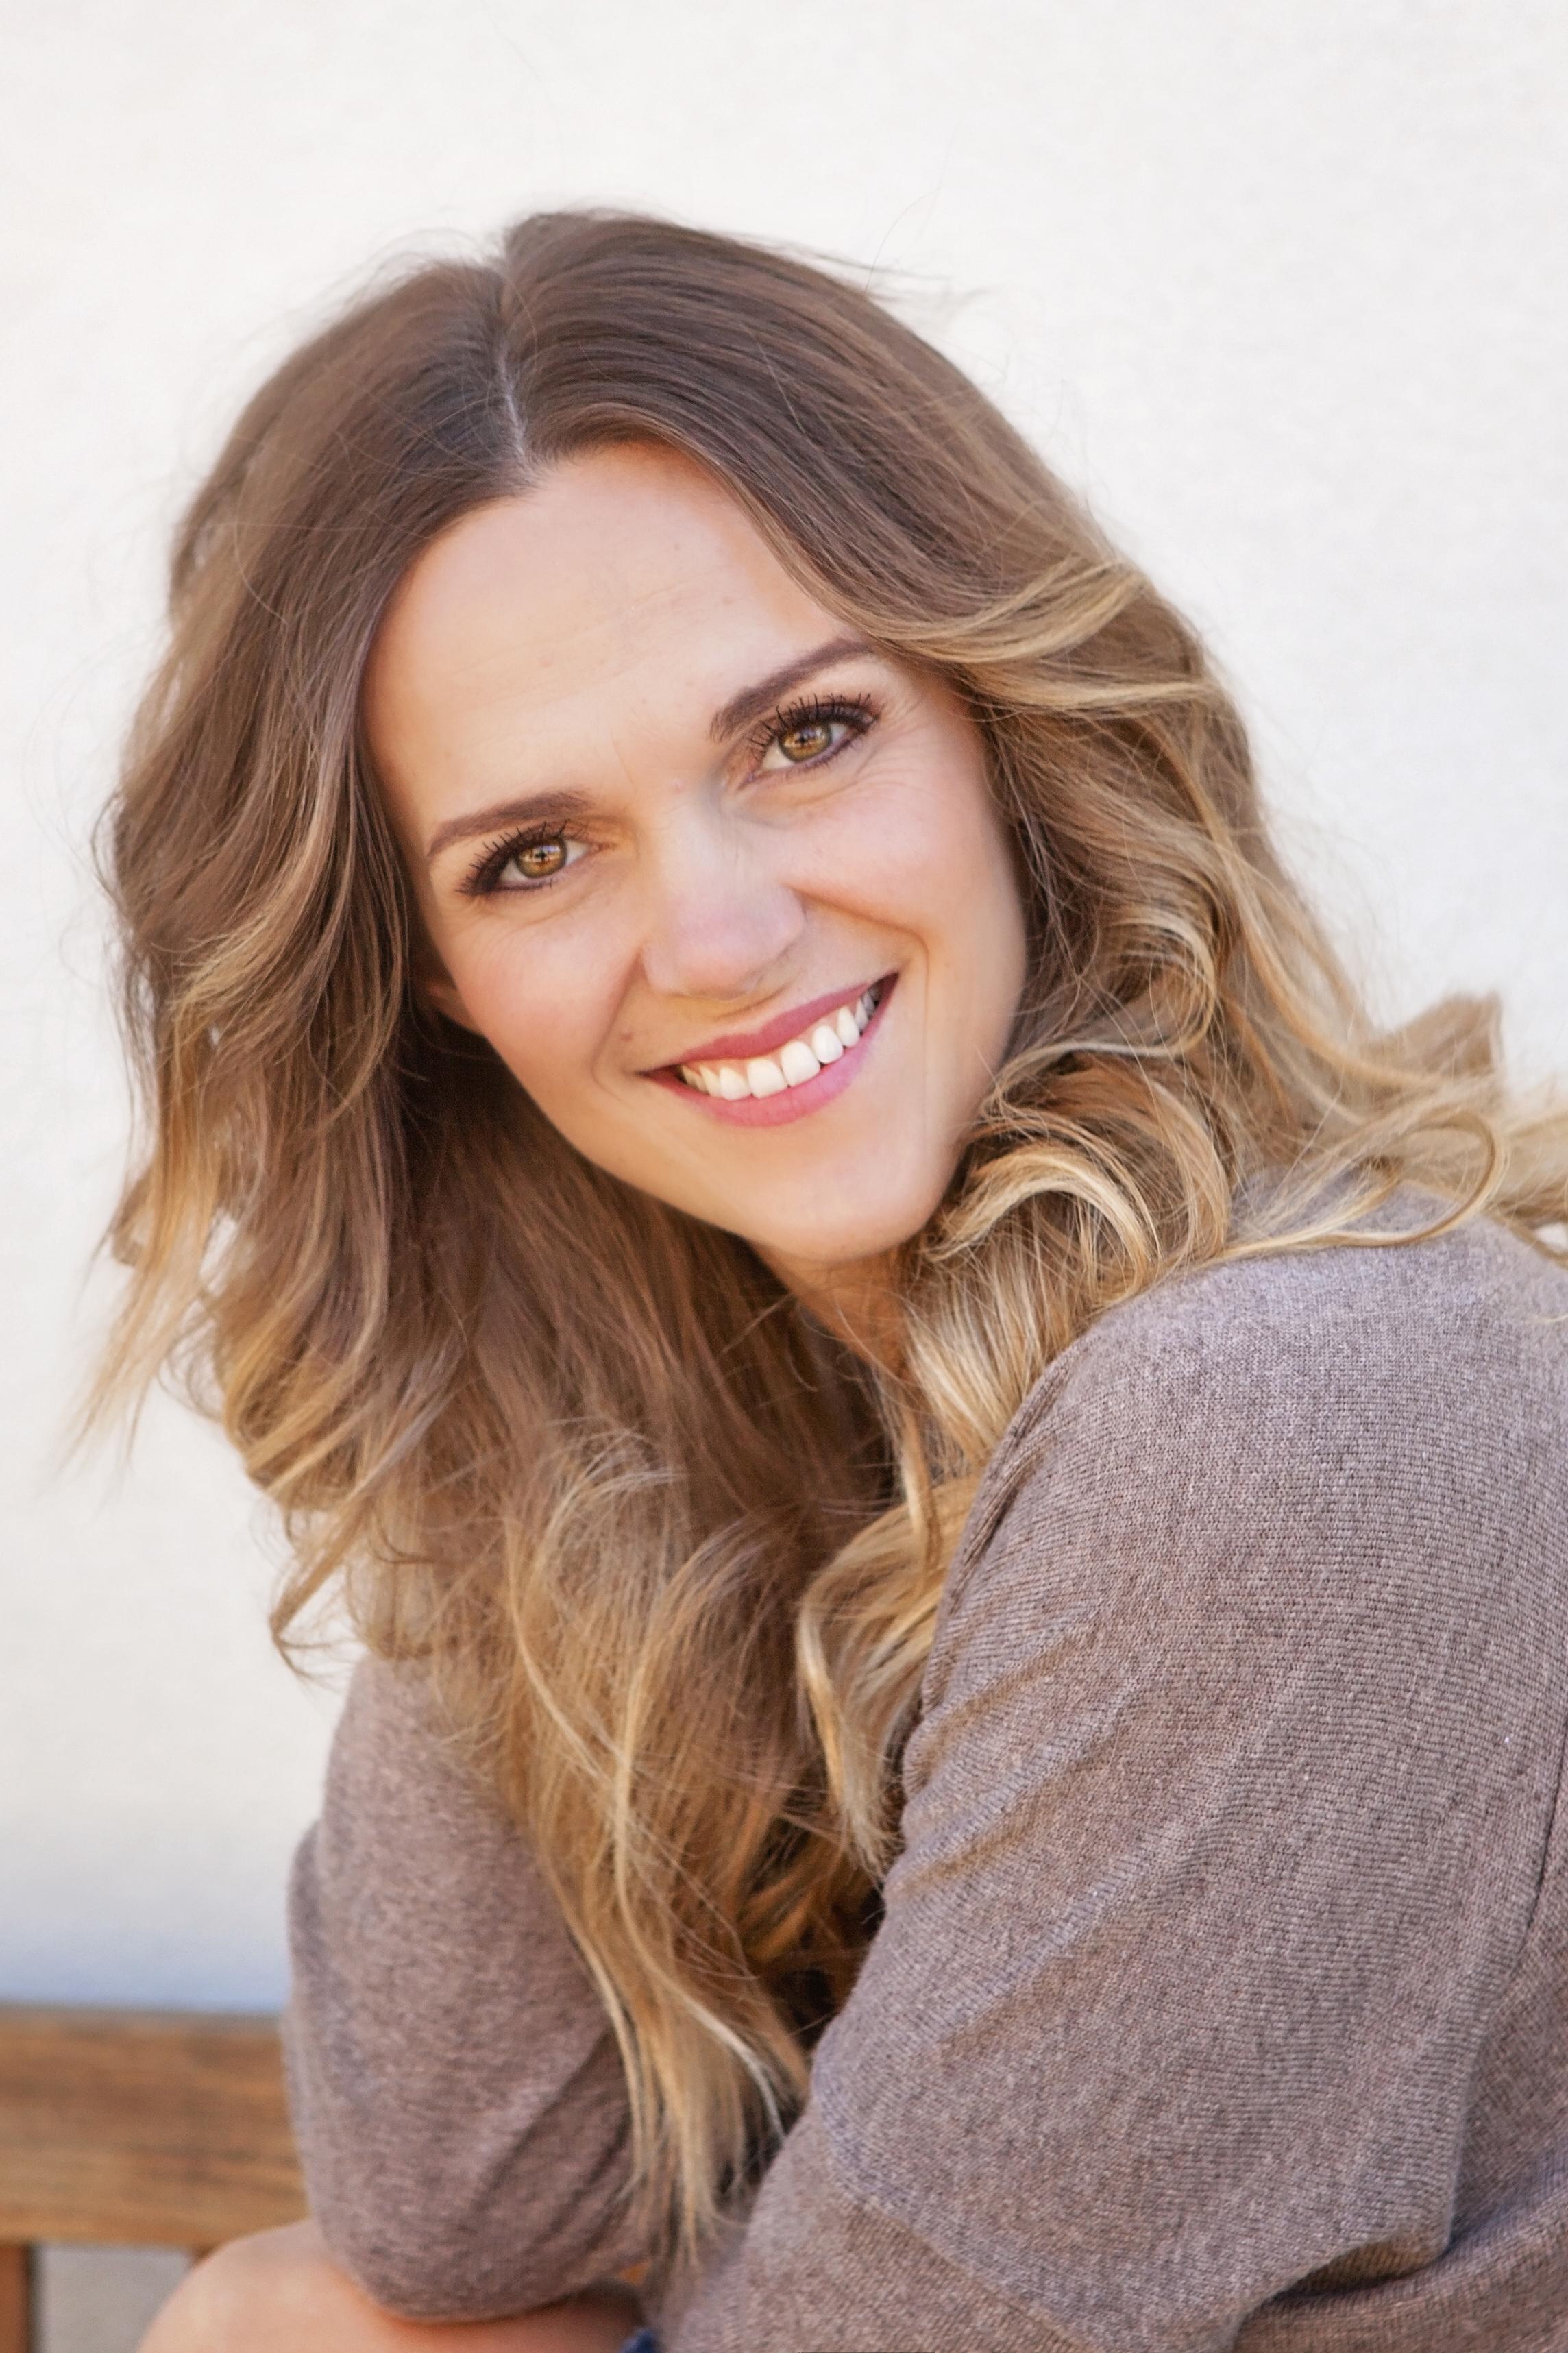 Amanda Monroy Nelson